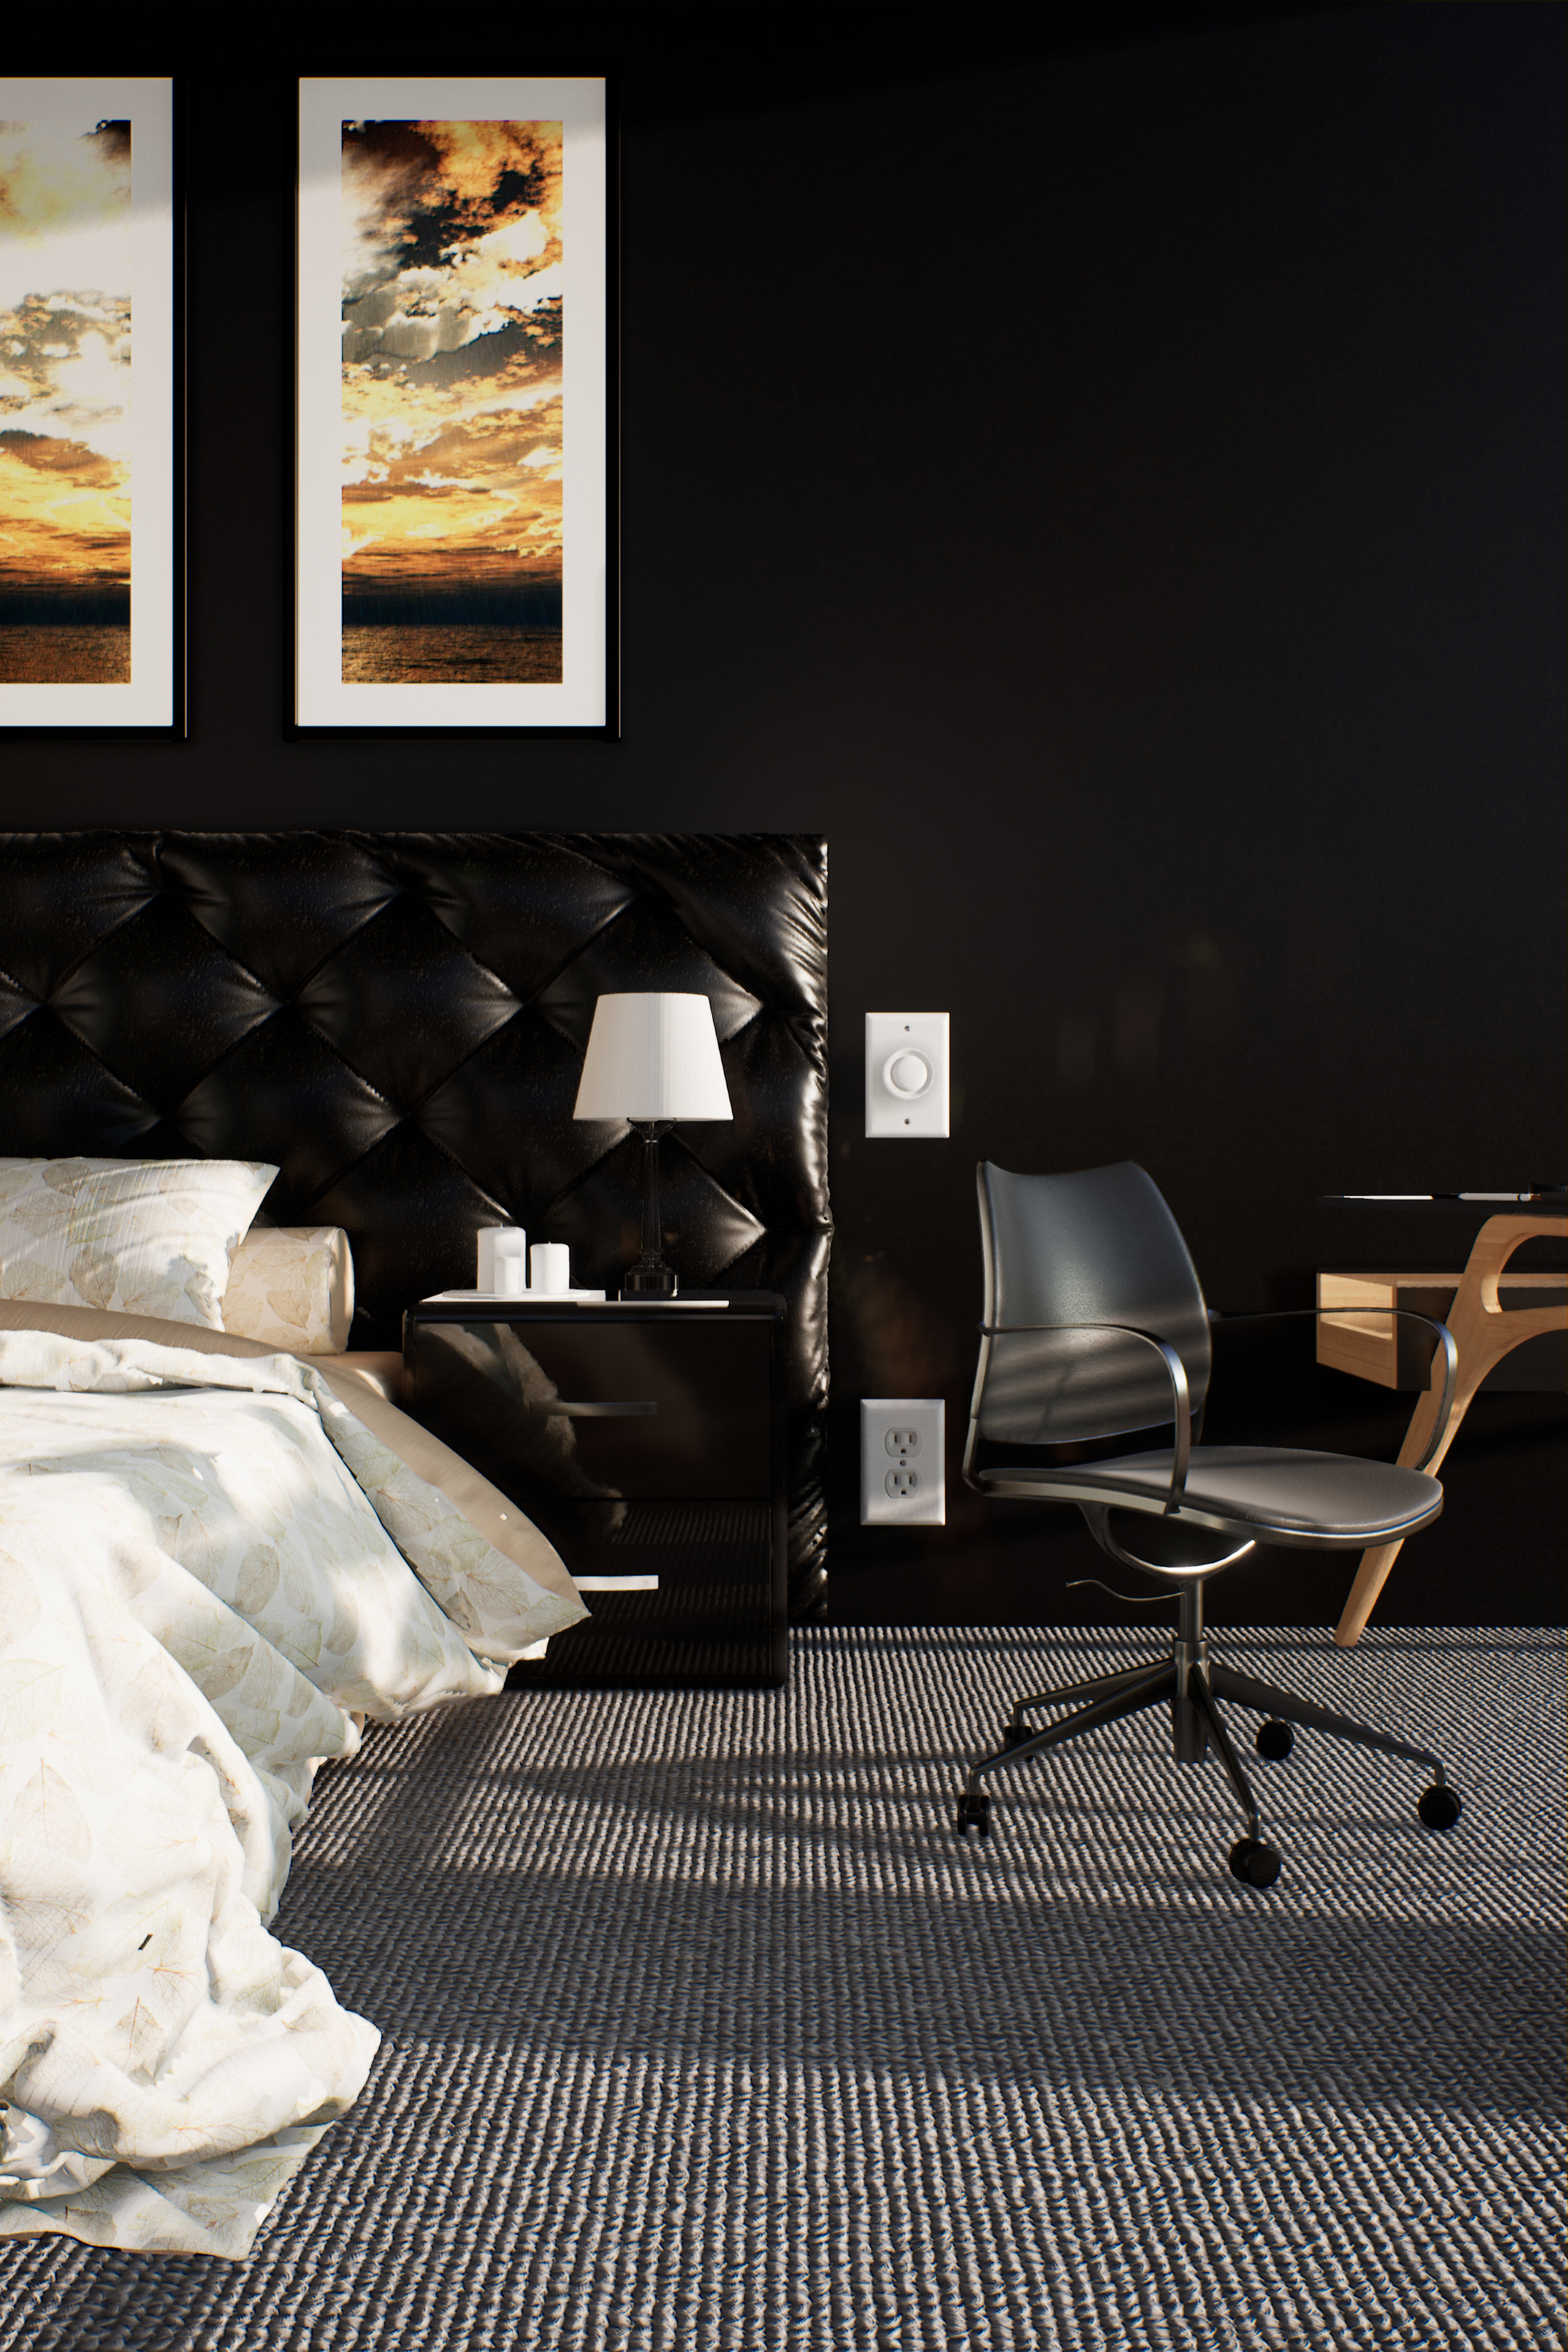 Bedroom_0002.jpg